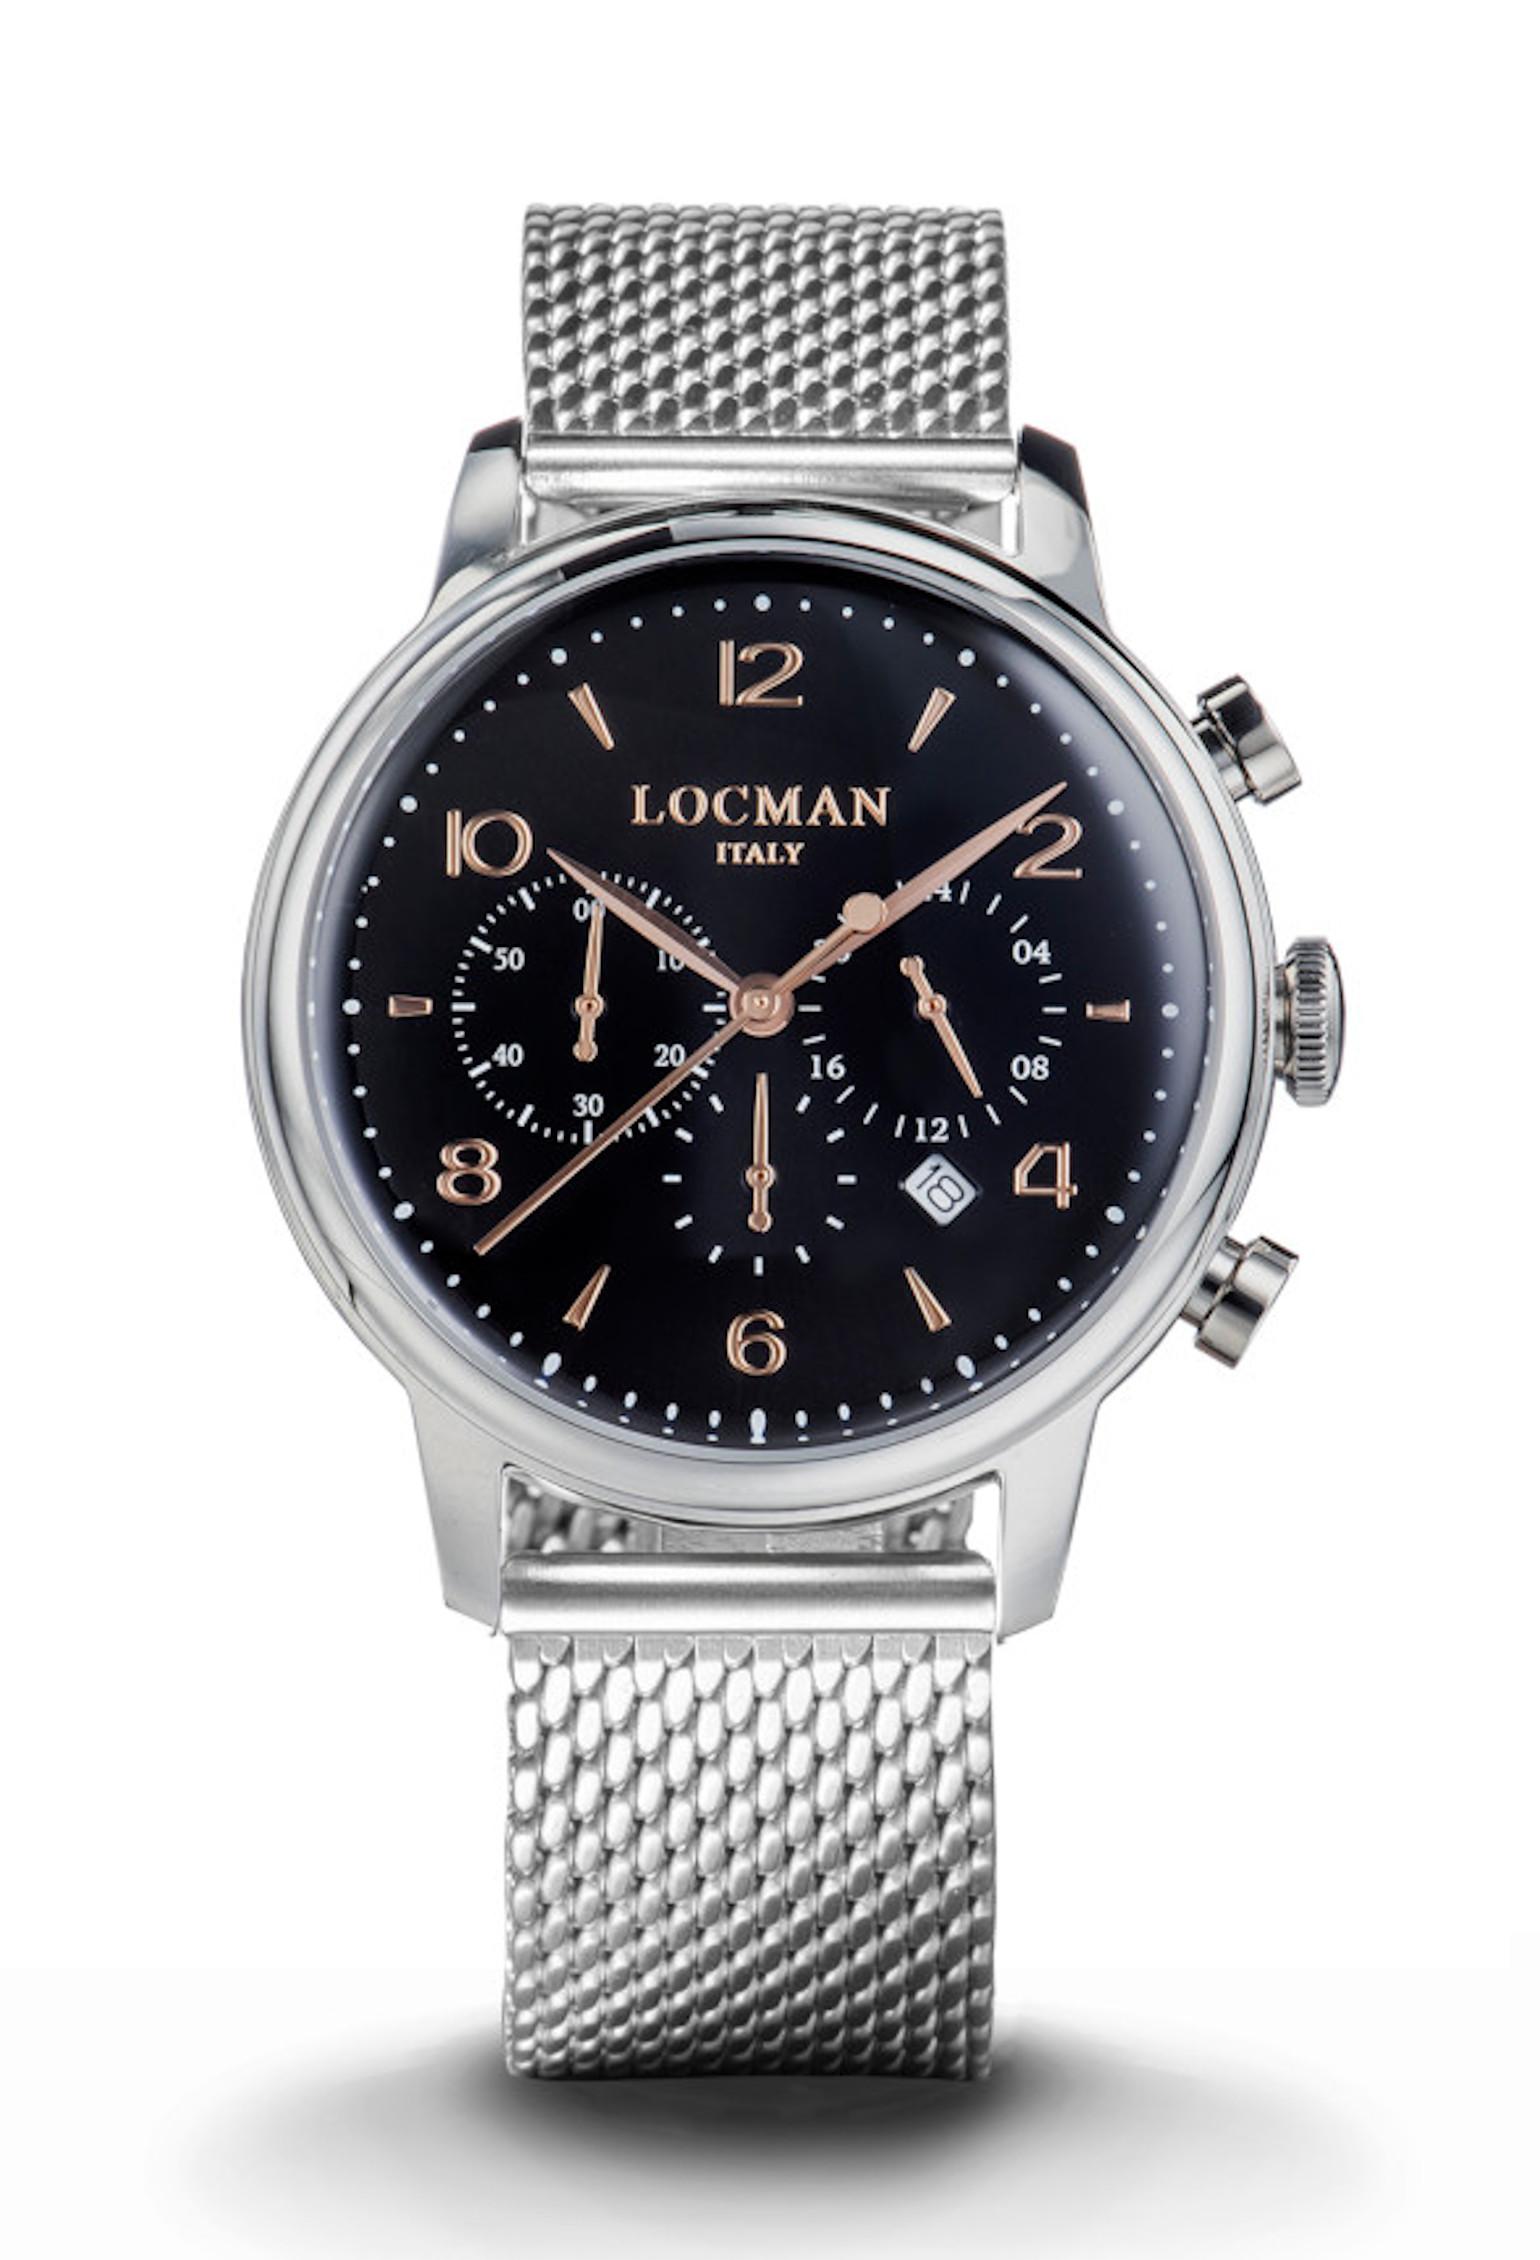 Locman 1960 Cronografo0254A01R-00BKRG2B0